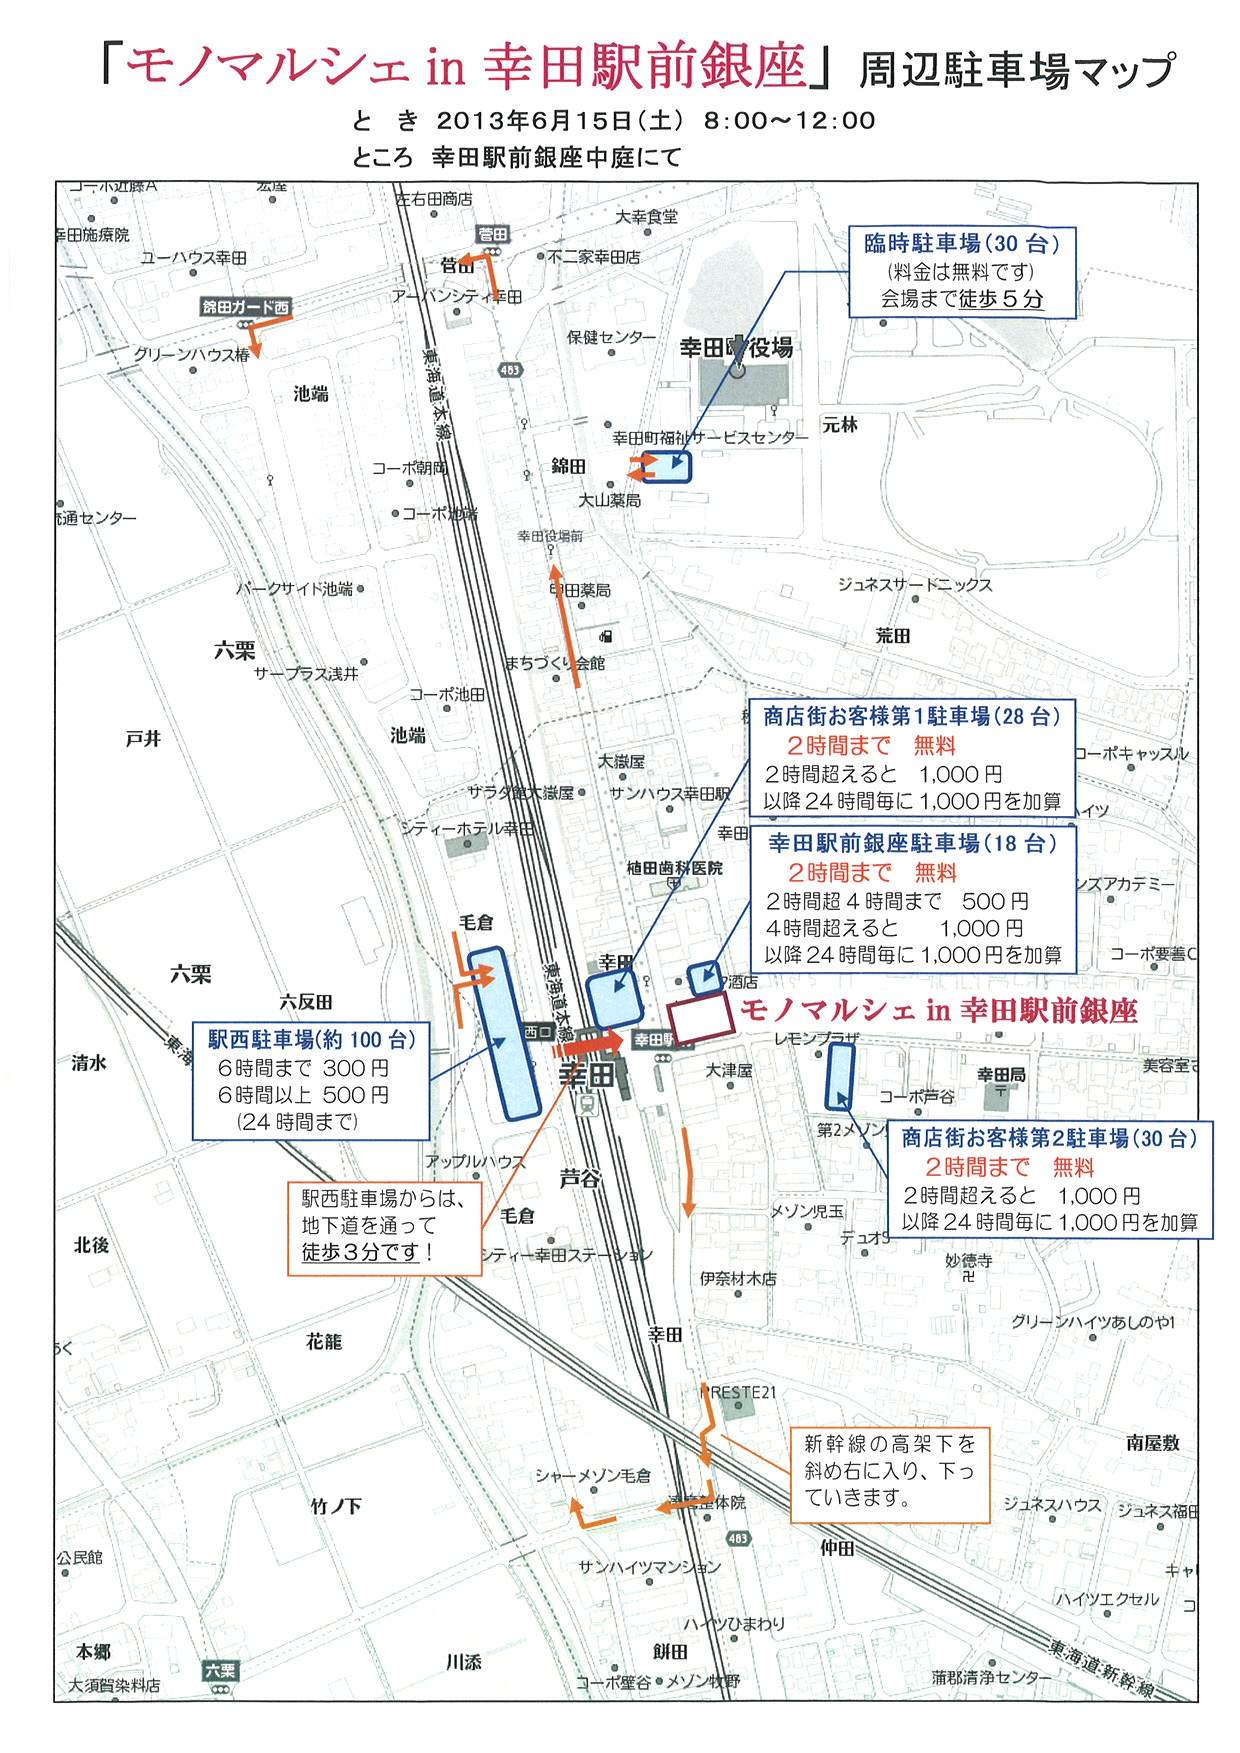 http://koutaginza.jp/blog/ginza_6.15_Pmap.jpg